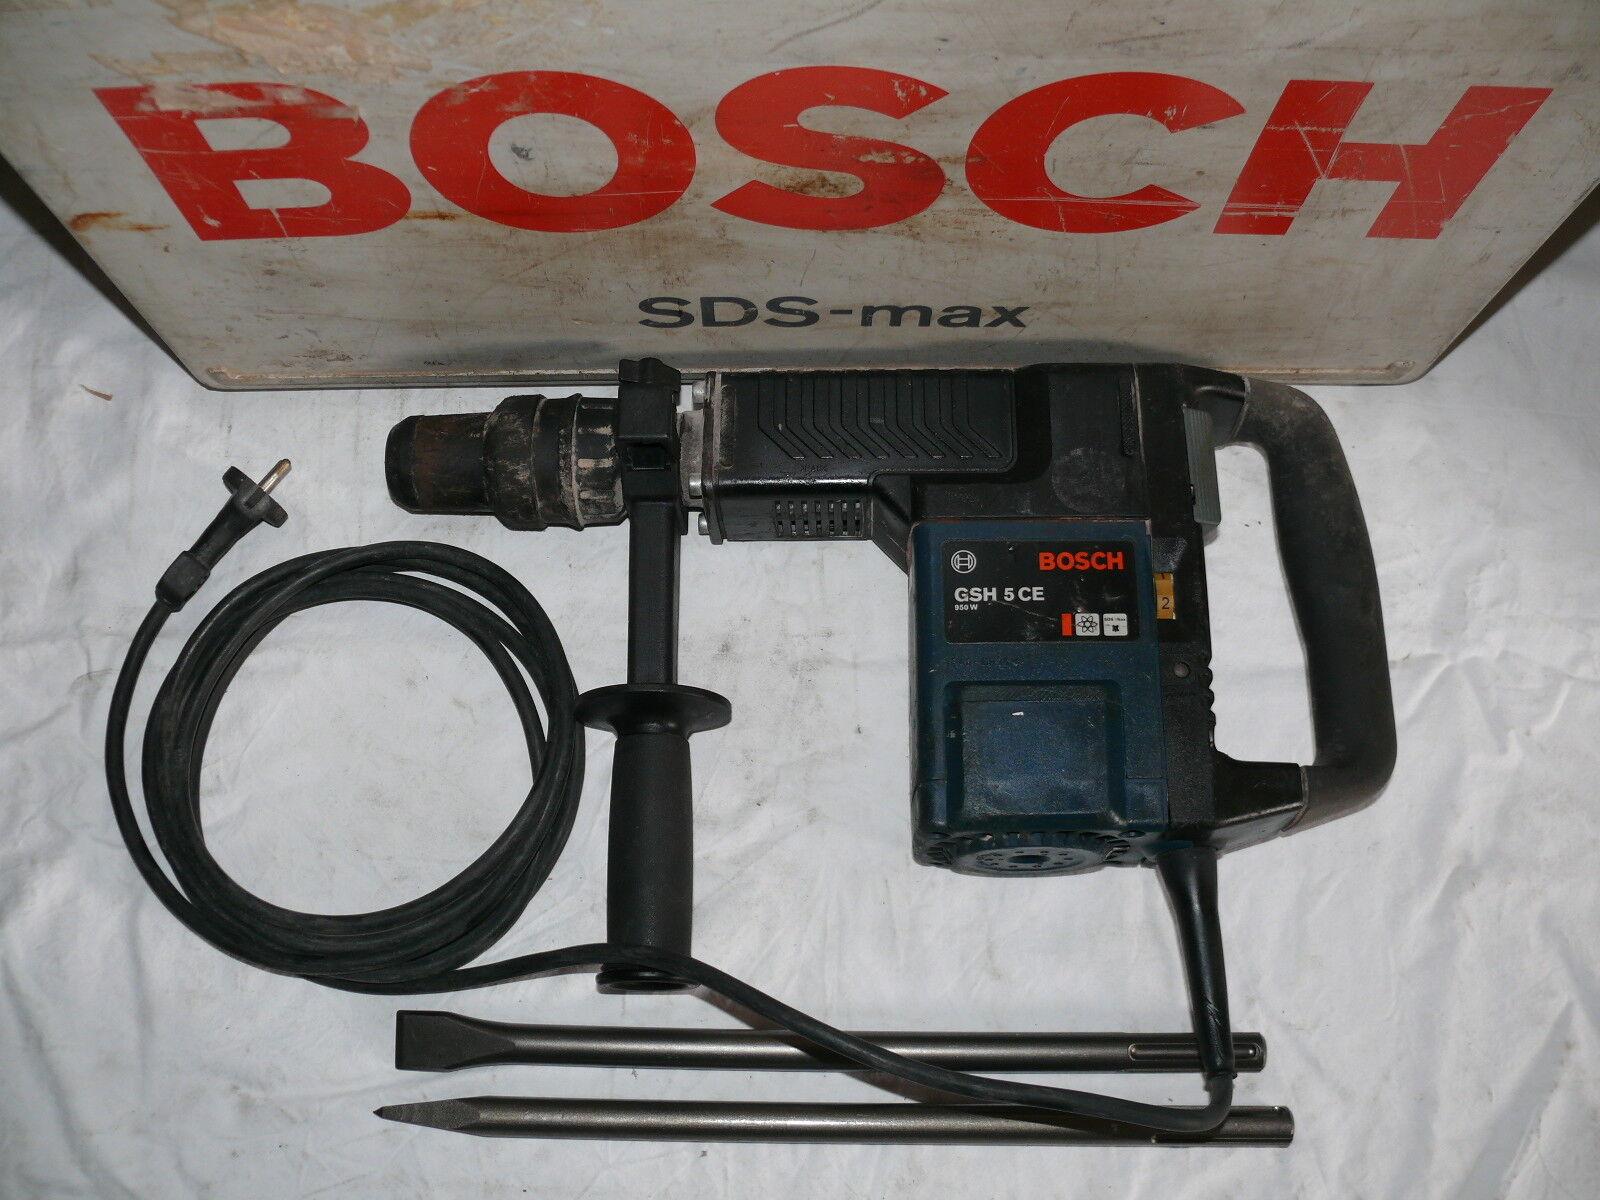 Bosch GSH 5 CE MEISSELHAMMER STEMMHAMMER SCHLAGHAMMER BOSCHHAMMER ABBRUCHHAMMER